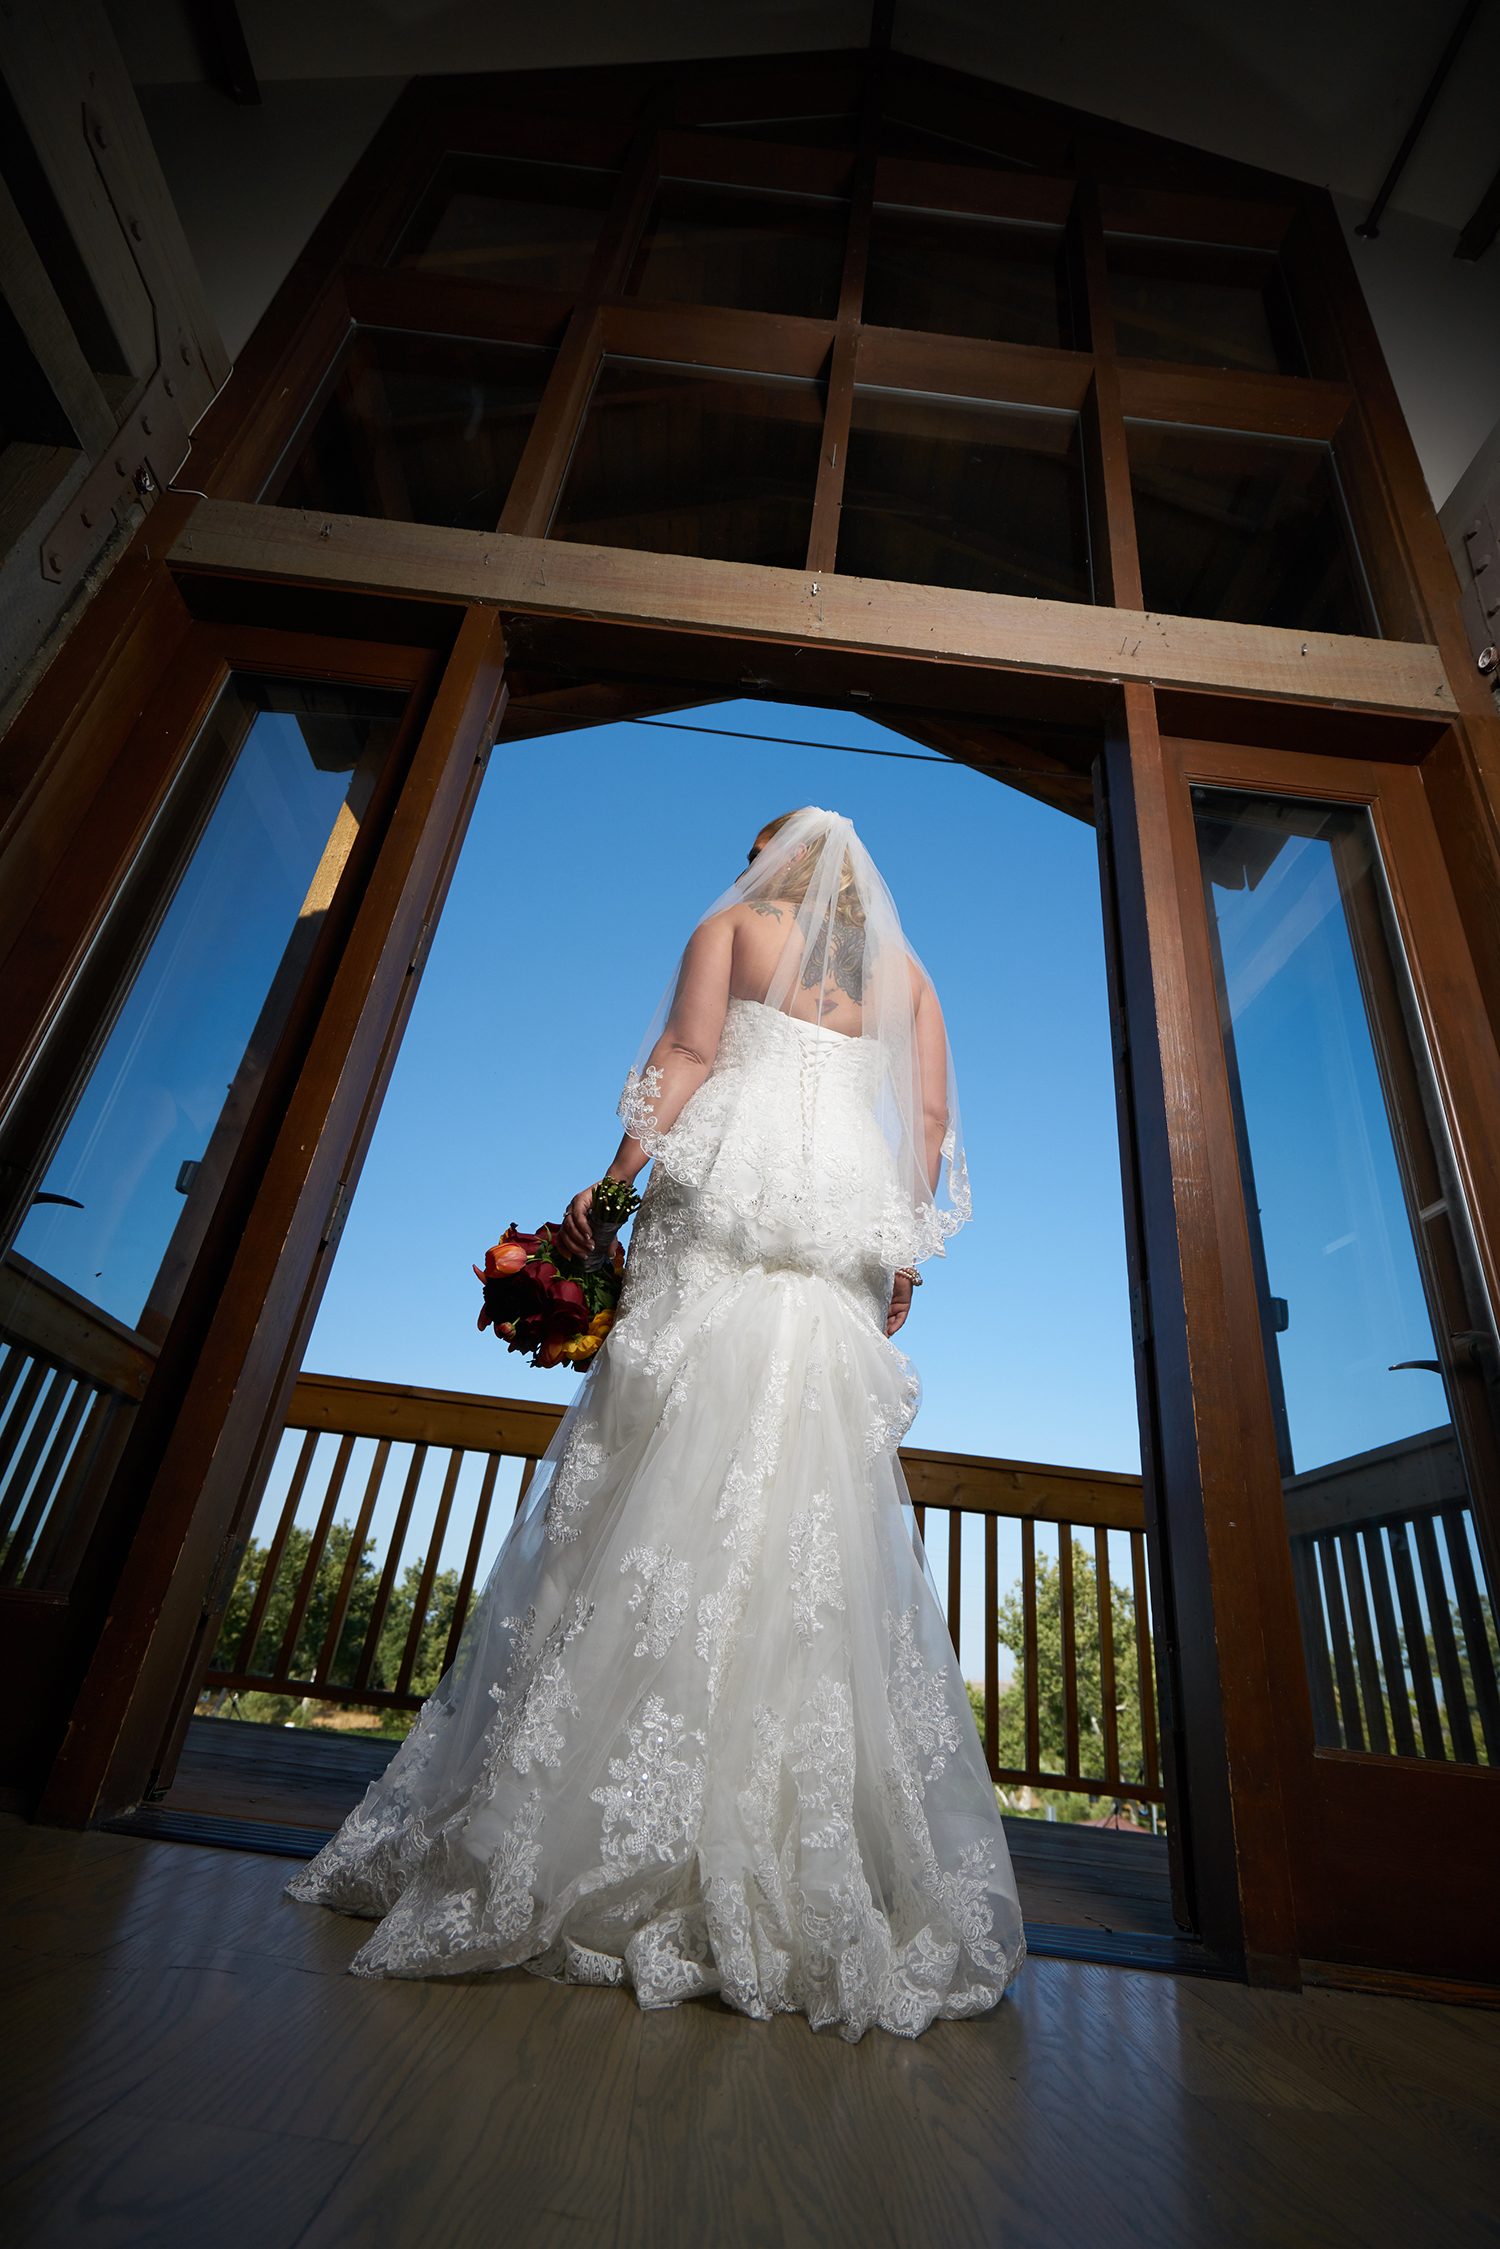 081217_Rachel_Chris_a0216-weddingdress-bride-weddingphotography-weddingphotographer-bridal-groom-wedding-engagementring-proposal-brides-diamondring-sonyalpha-sony-sonya9-sonya7rii-sanfrancisco-sf-bayarea-photographer-profoto-murrietas-well.jpg